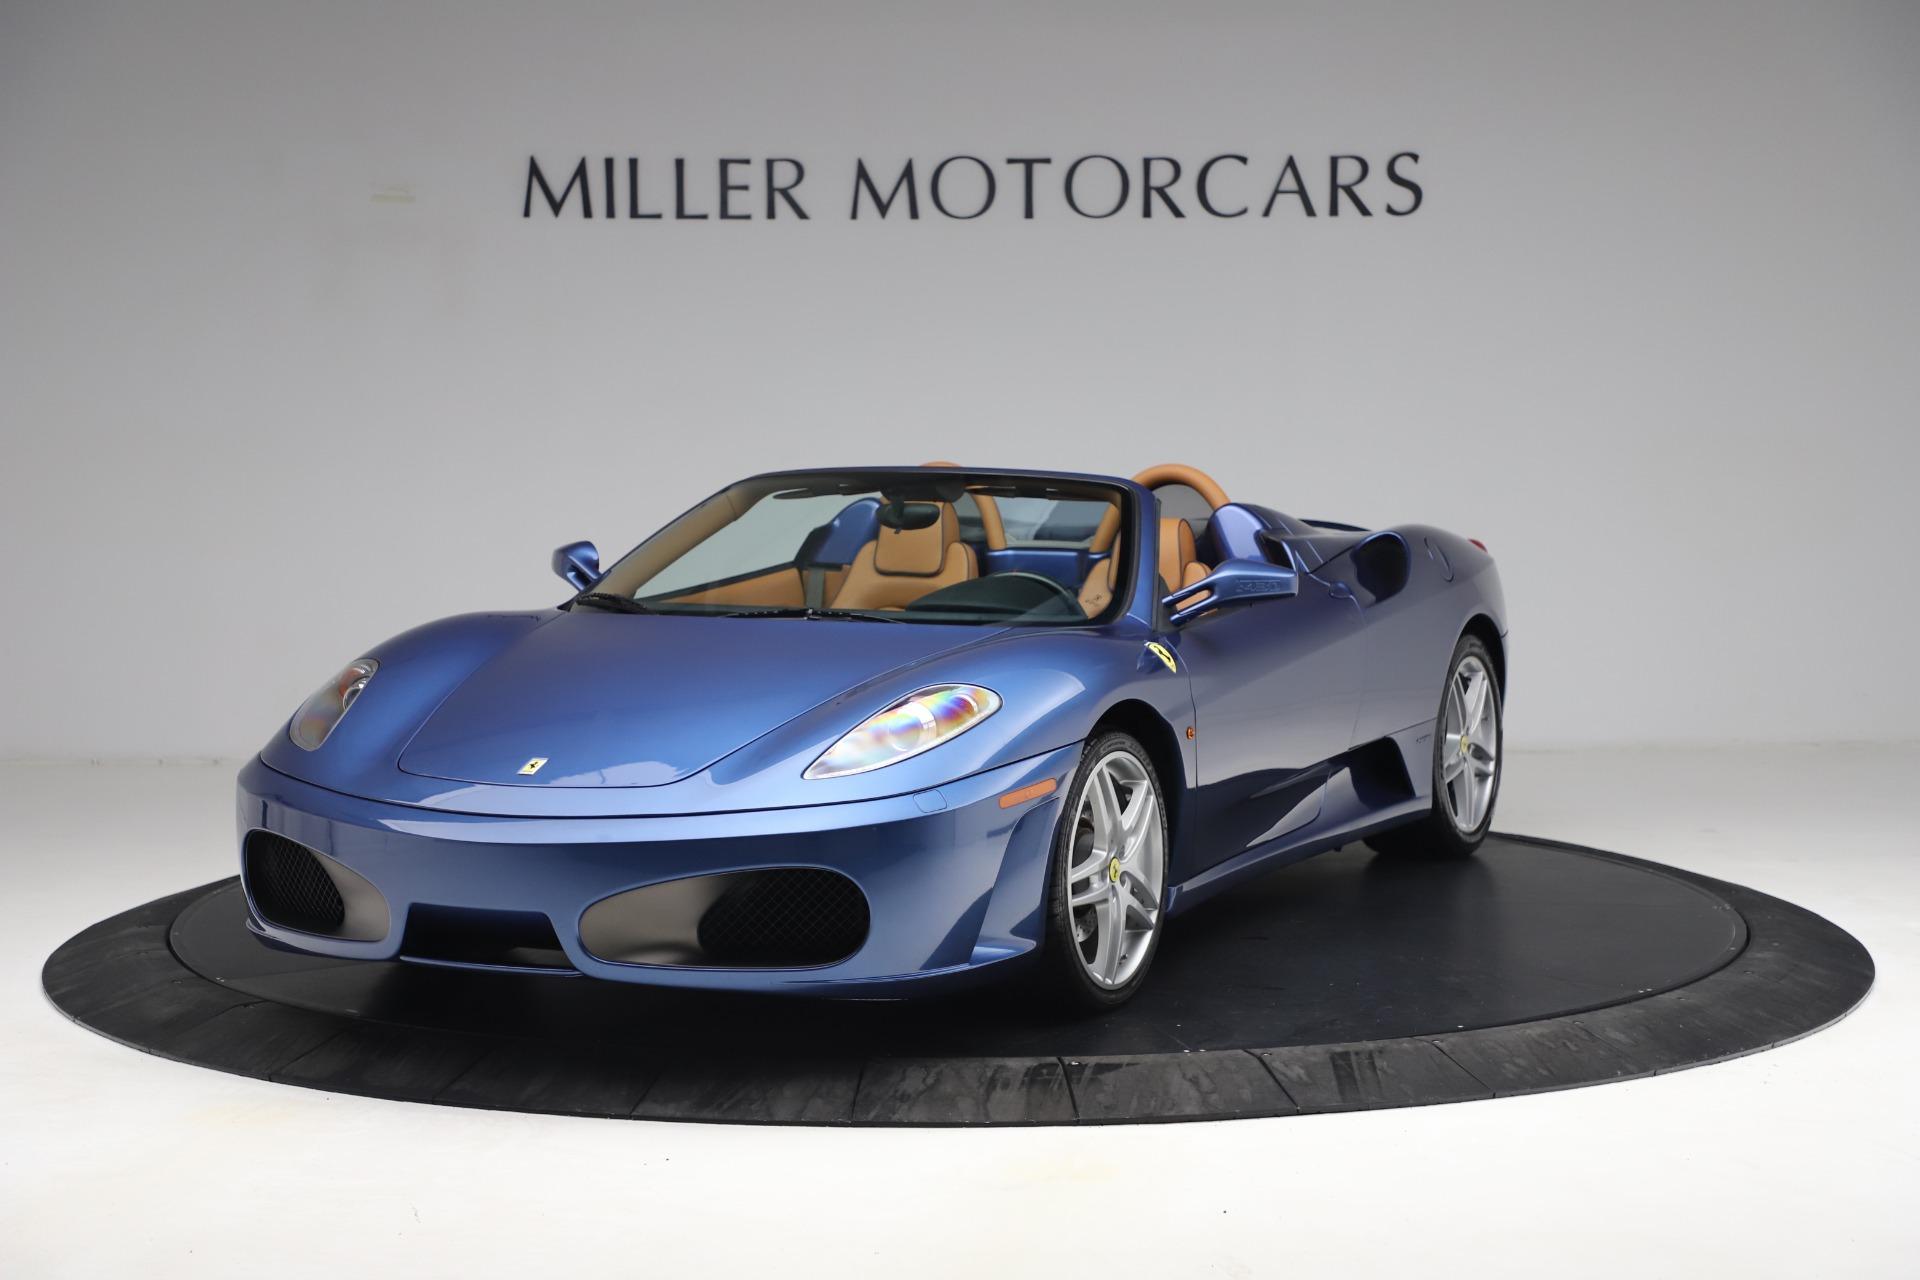 Used 2006 Ferrari F430 Spider for sale $139,900 at McLaren Greenwich in Greenwich CT 06830 1